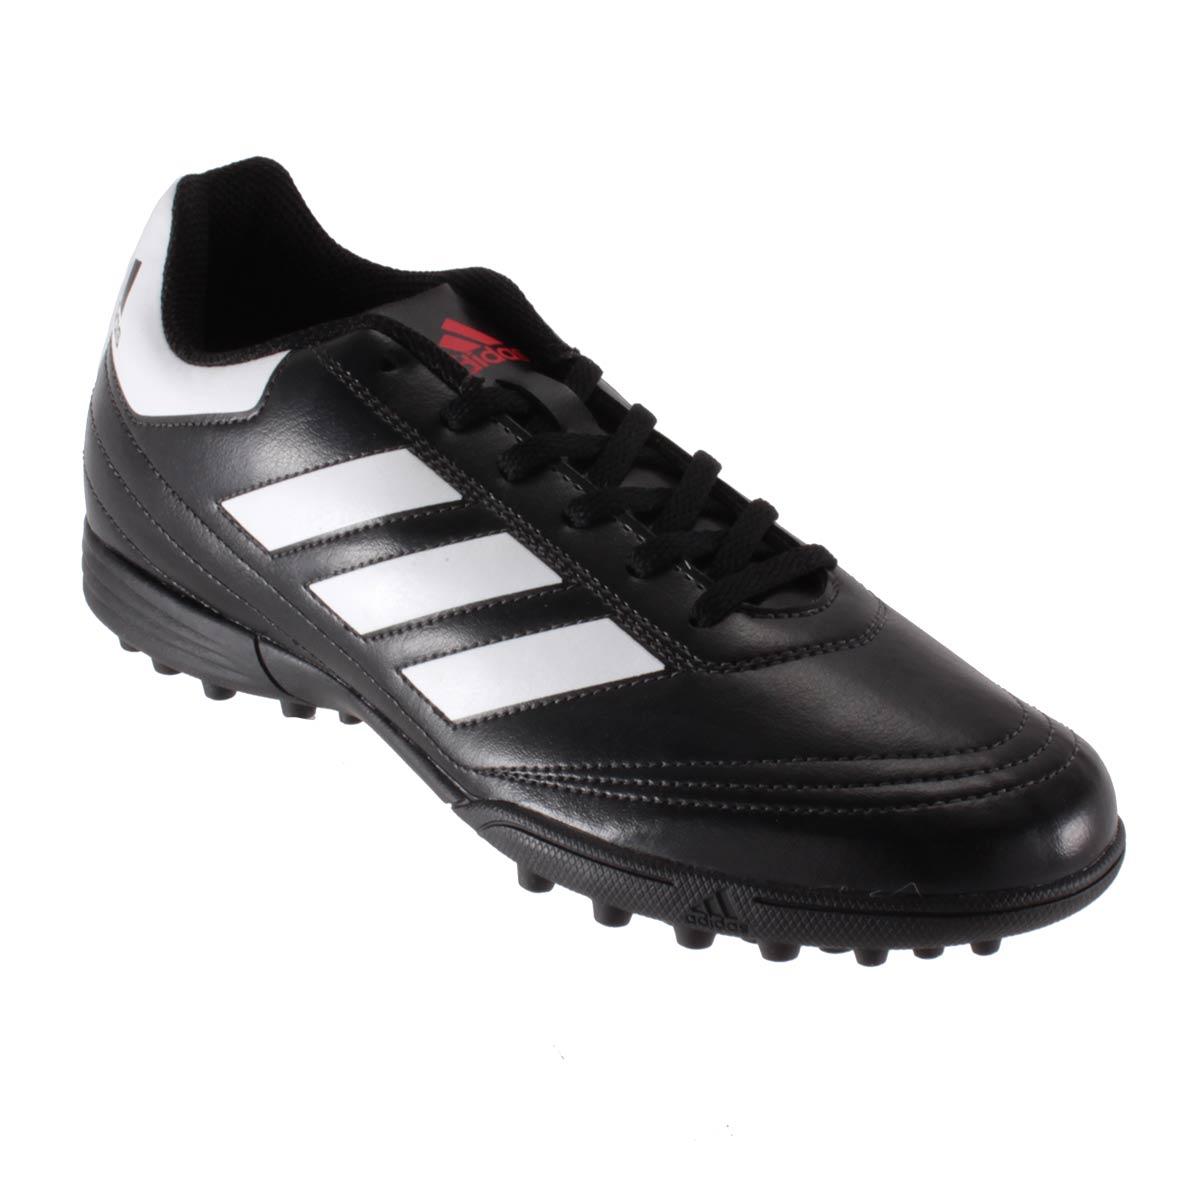 Chuteira Adidas Goletto 6 TF Society Masculino Futebol Tênis AQ4299